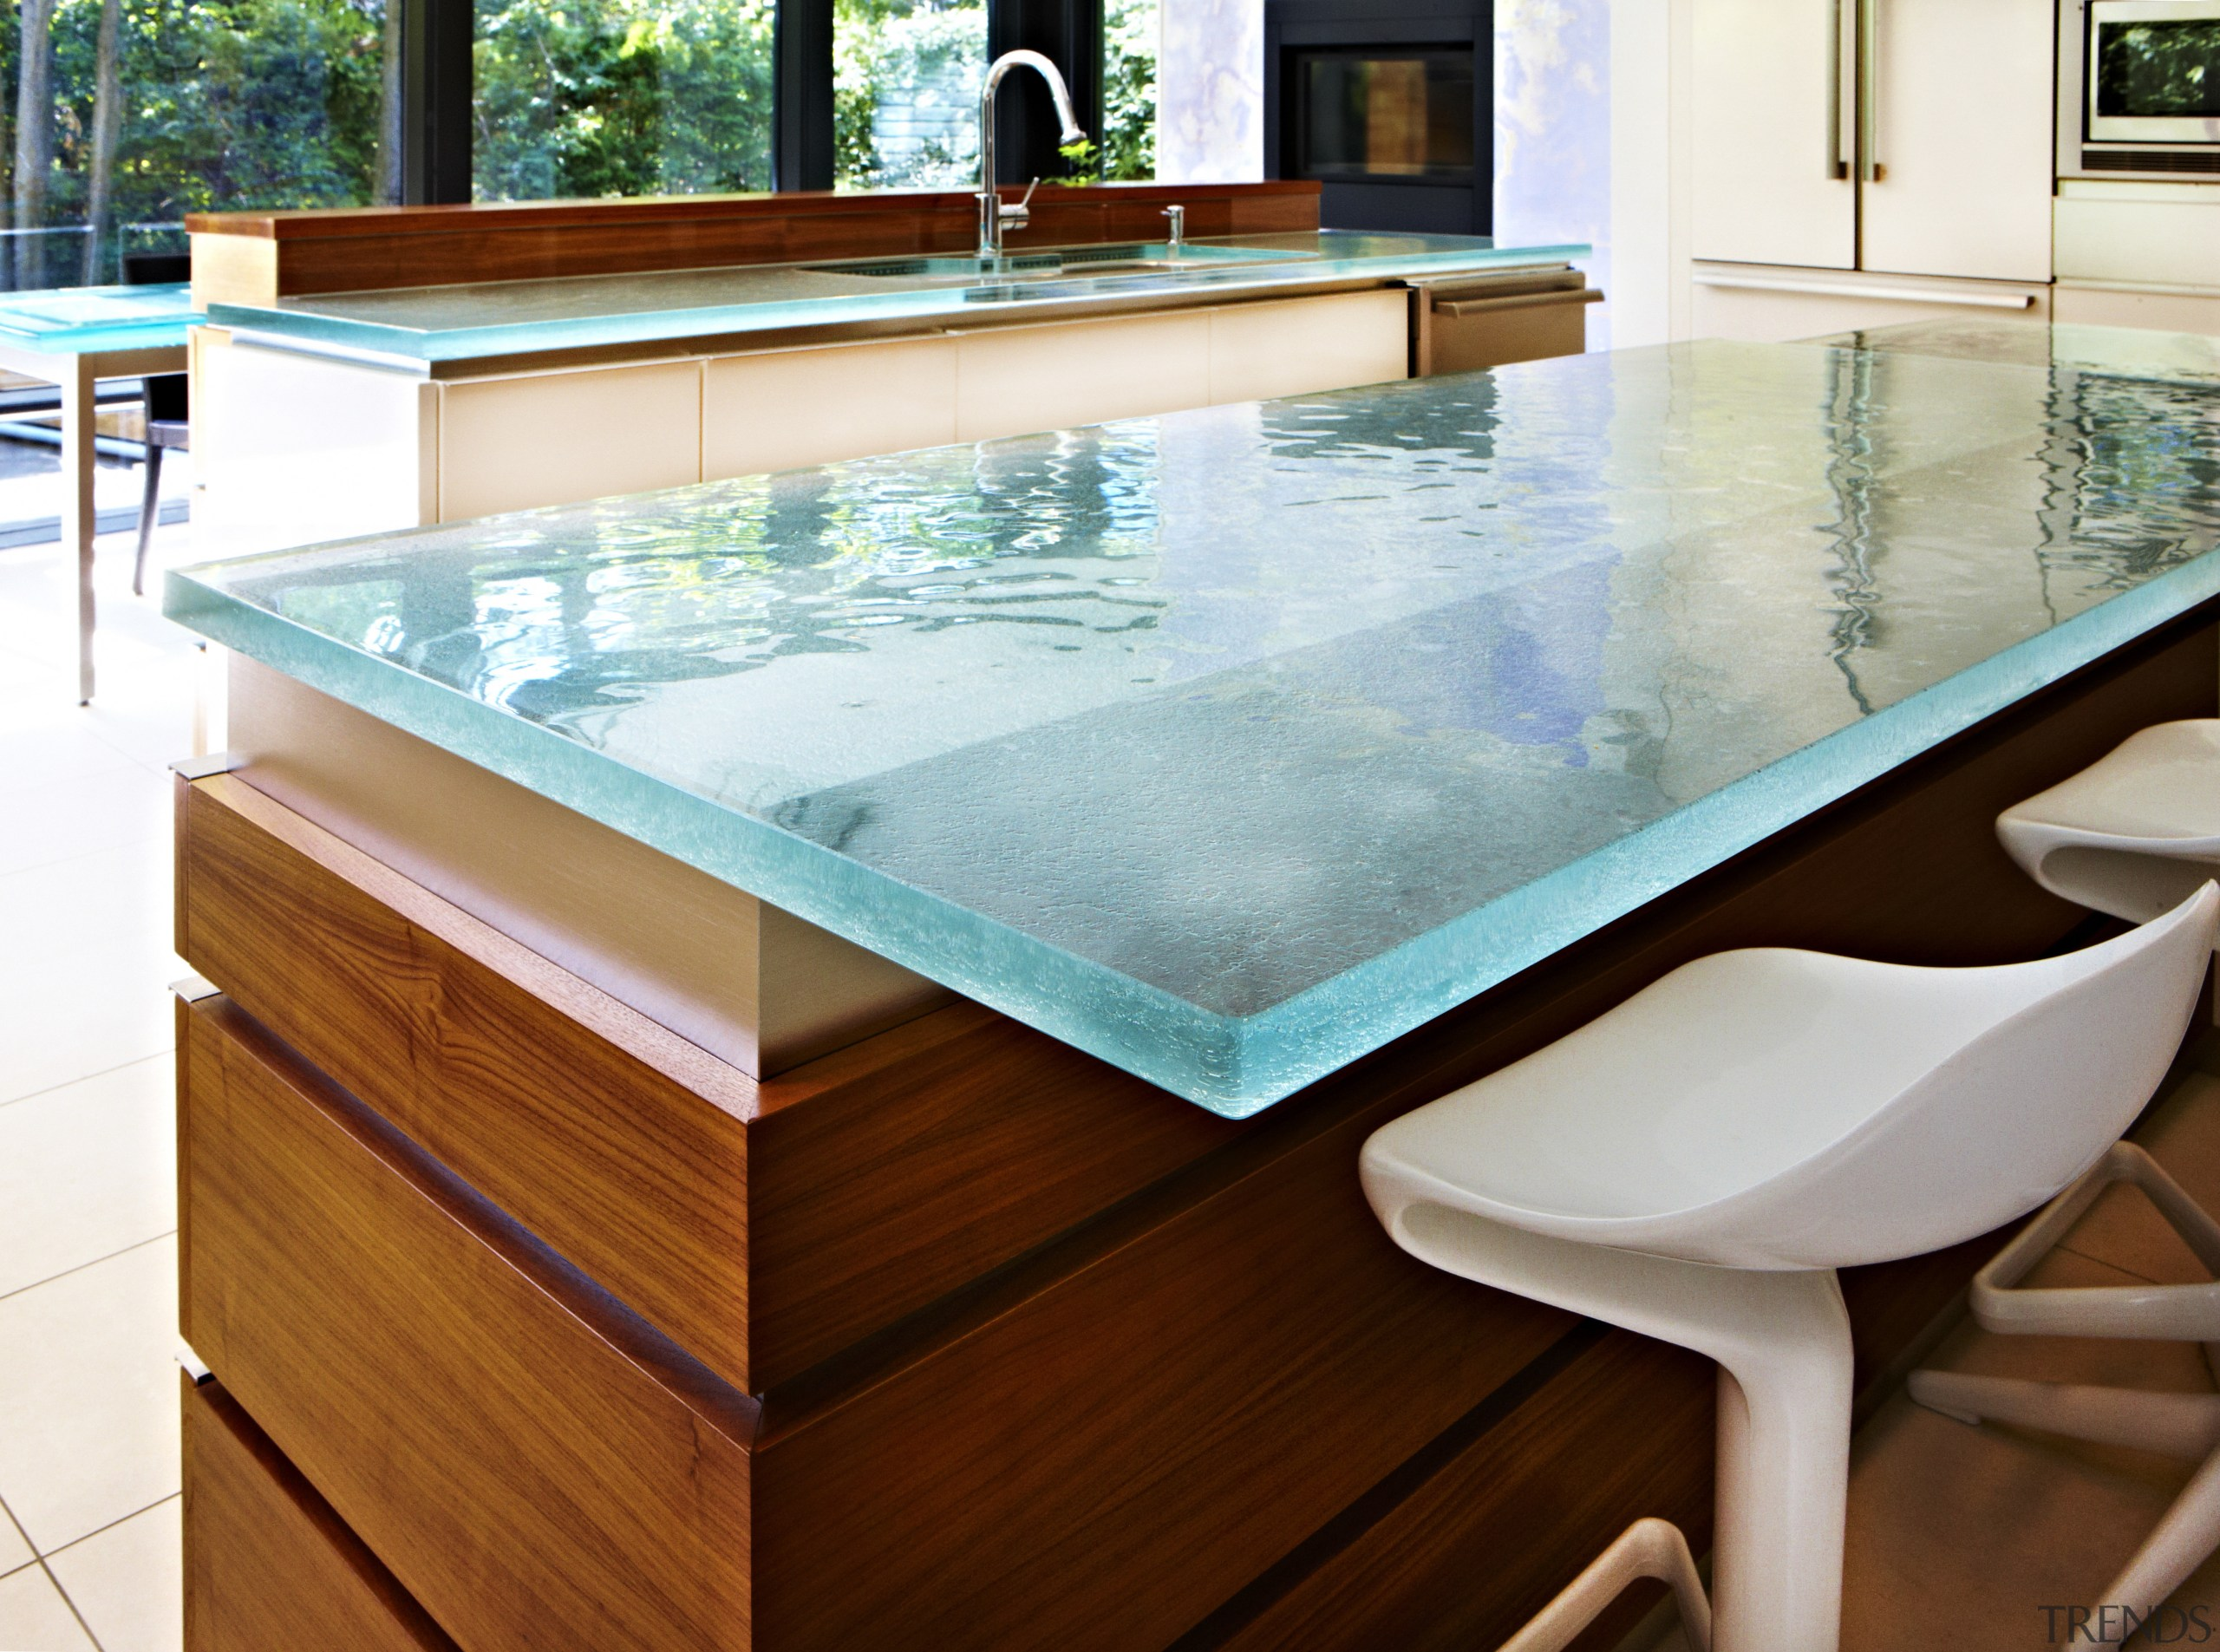 Custom glass countertop by ThinkGlass - Custom glass countertop, floor, furniture, swimming pool, table, white